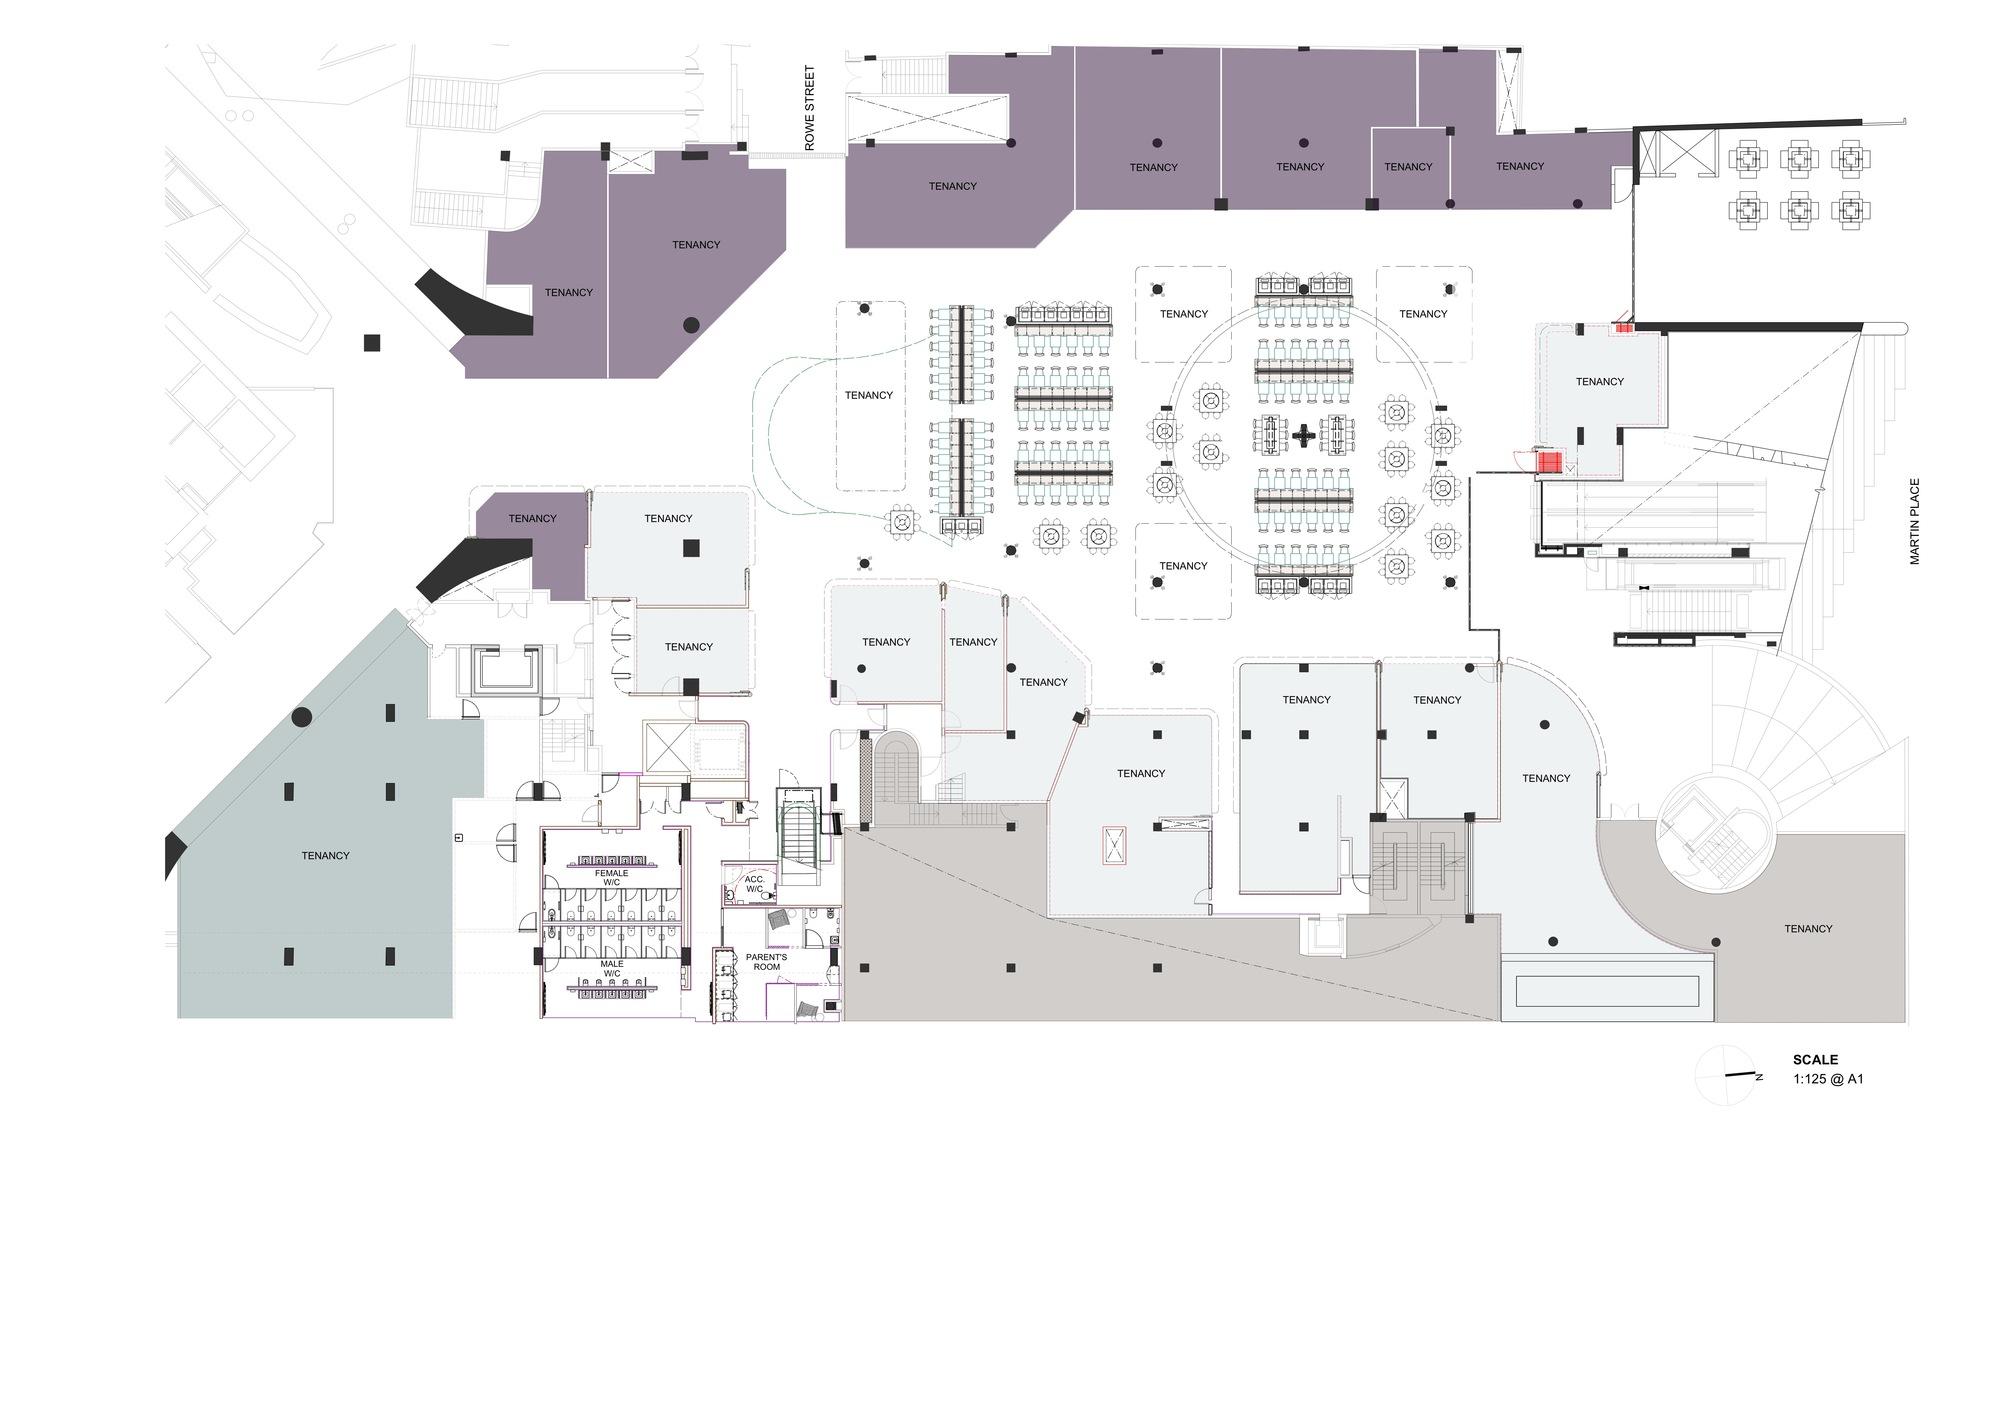 Gallery Floor Plans Gallery Of Mlc Centre Food Court Luchetti Krelle 18